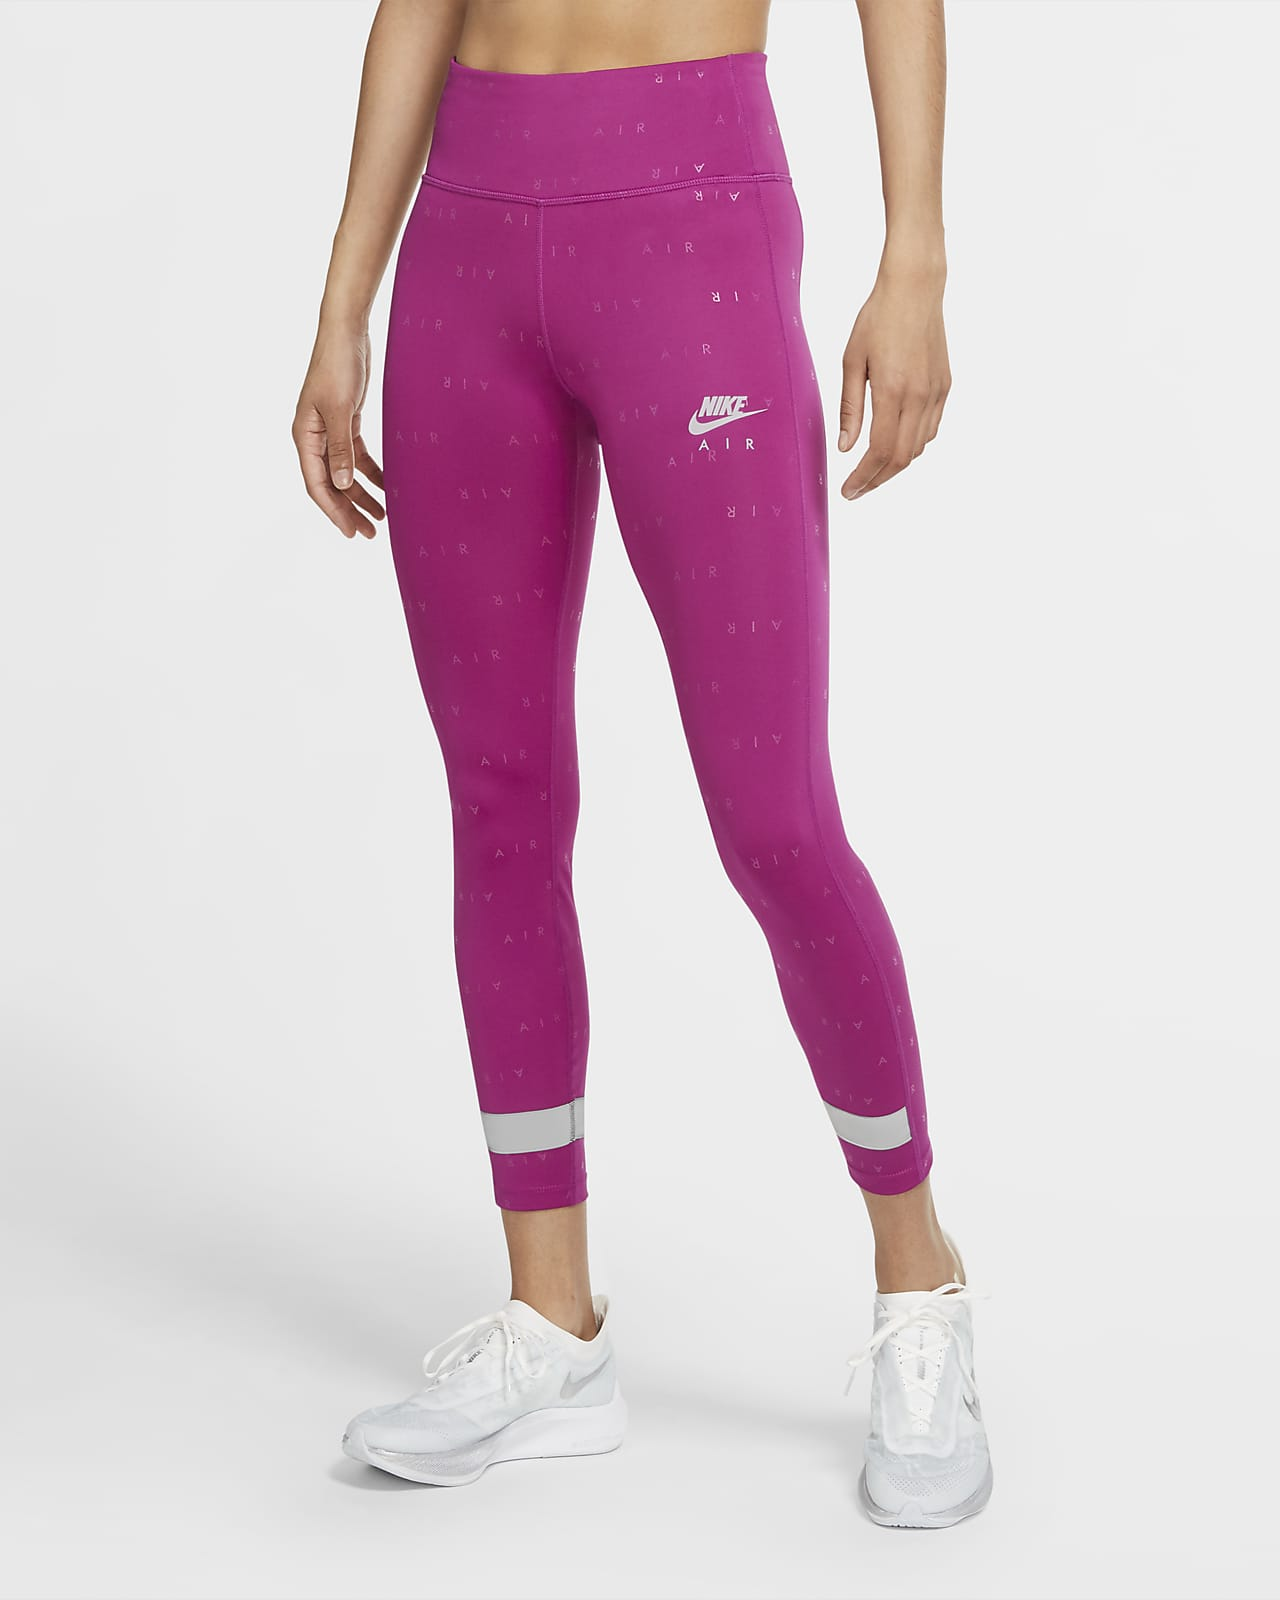 Nike Air 7/8-Lauf-Leggings für Damen